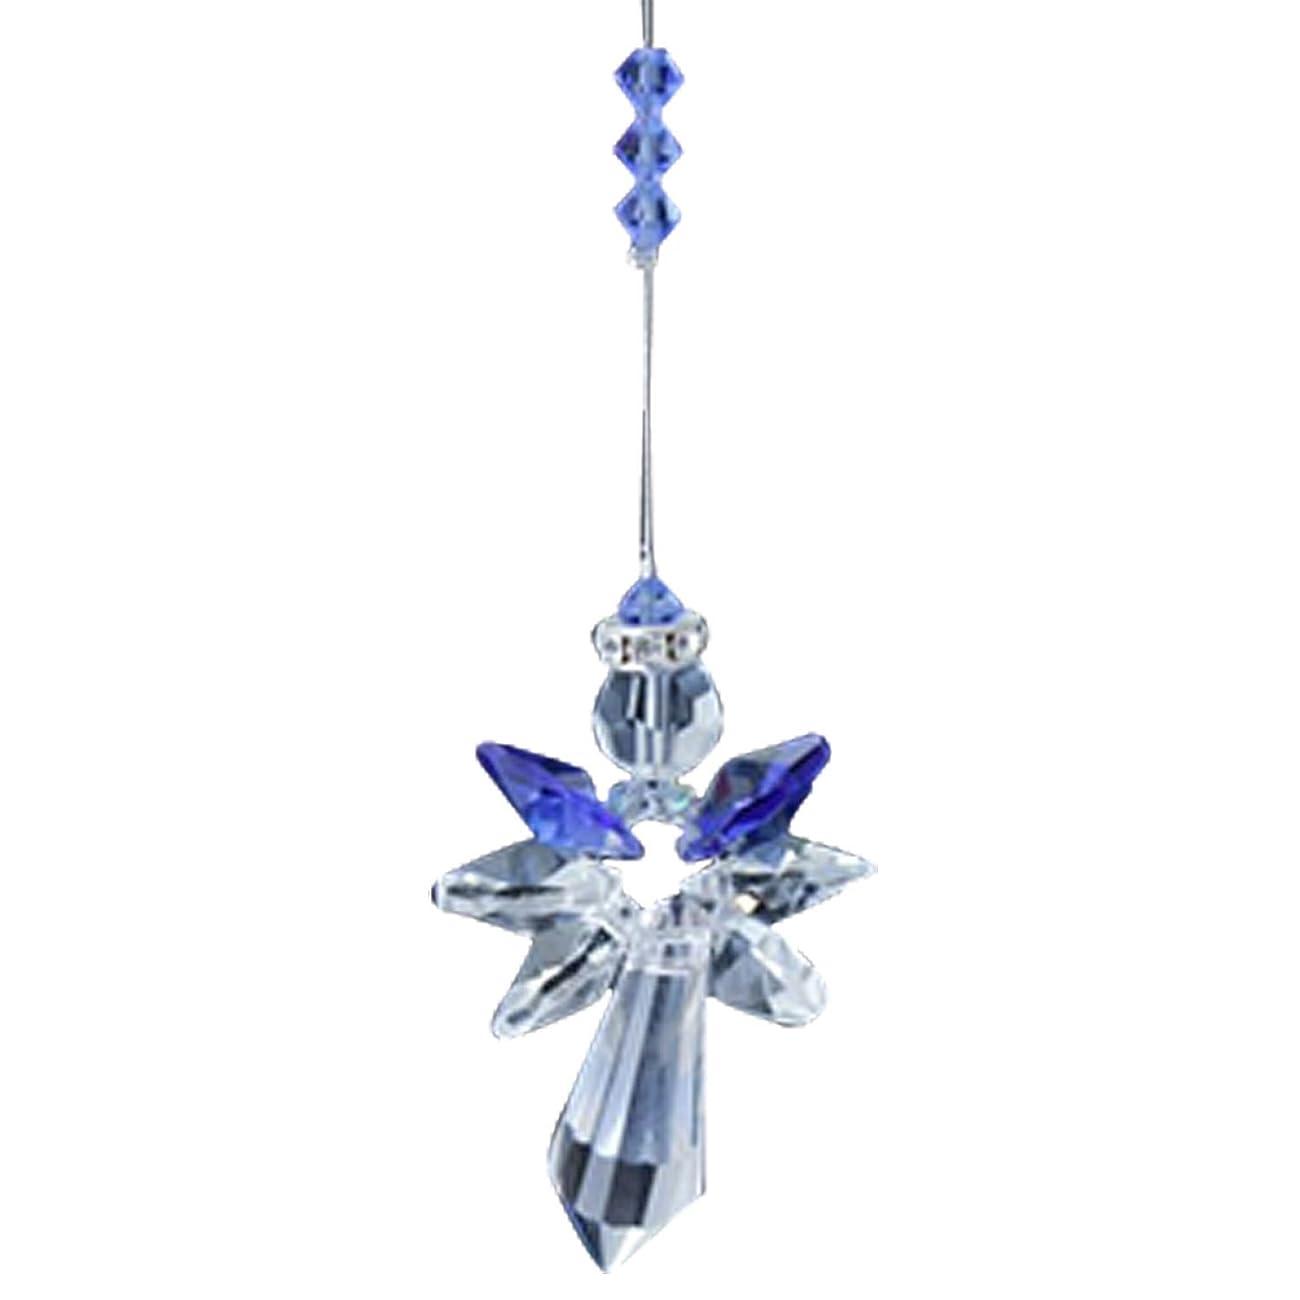 D4P Sapphire Blue Rainbow Maker Home Ornament Glass Decoration Living Room Bedroom Kitchen Car Mirror Porch Decor Figurine Hanging Crystal Suncatcher